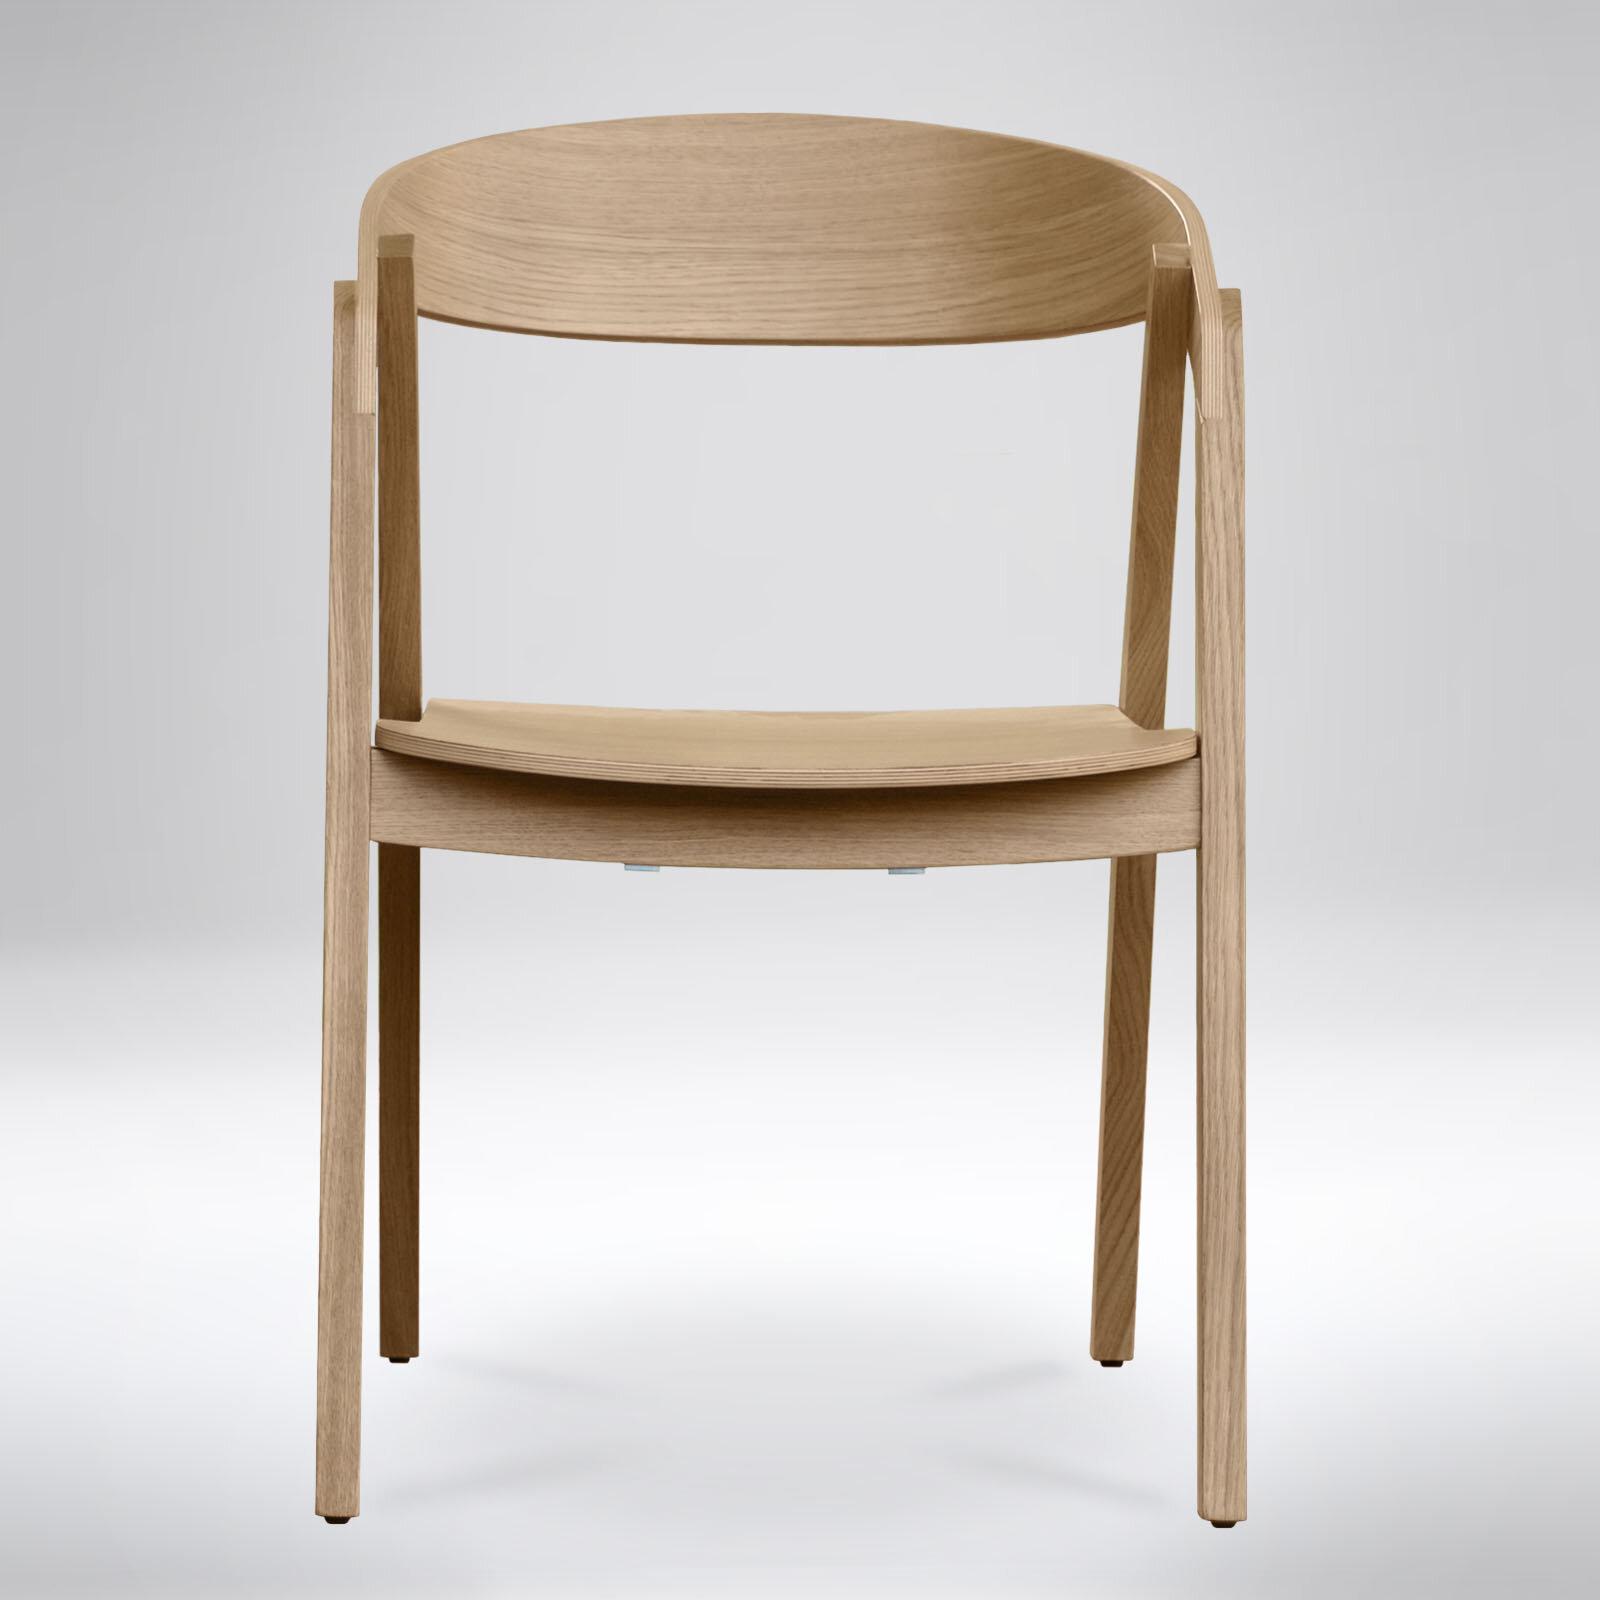 Groovy Barner Solid Wood Dining Chair Machost Co Dining Chair Design Ideas Machostcouk